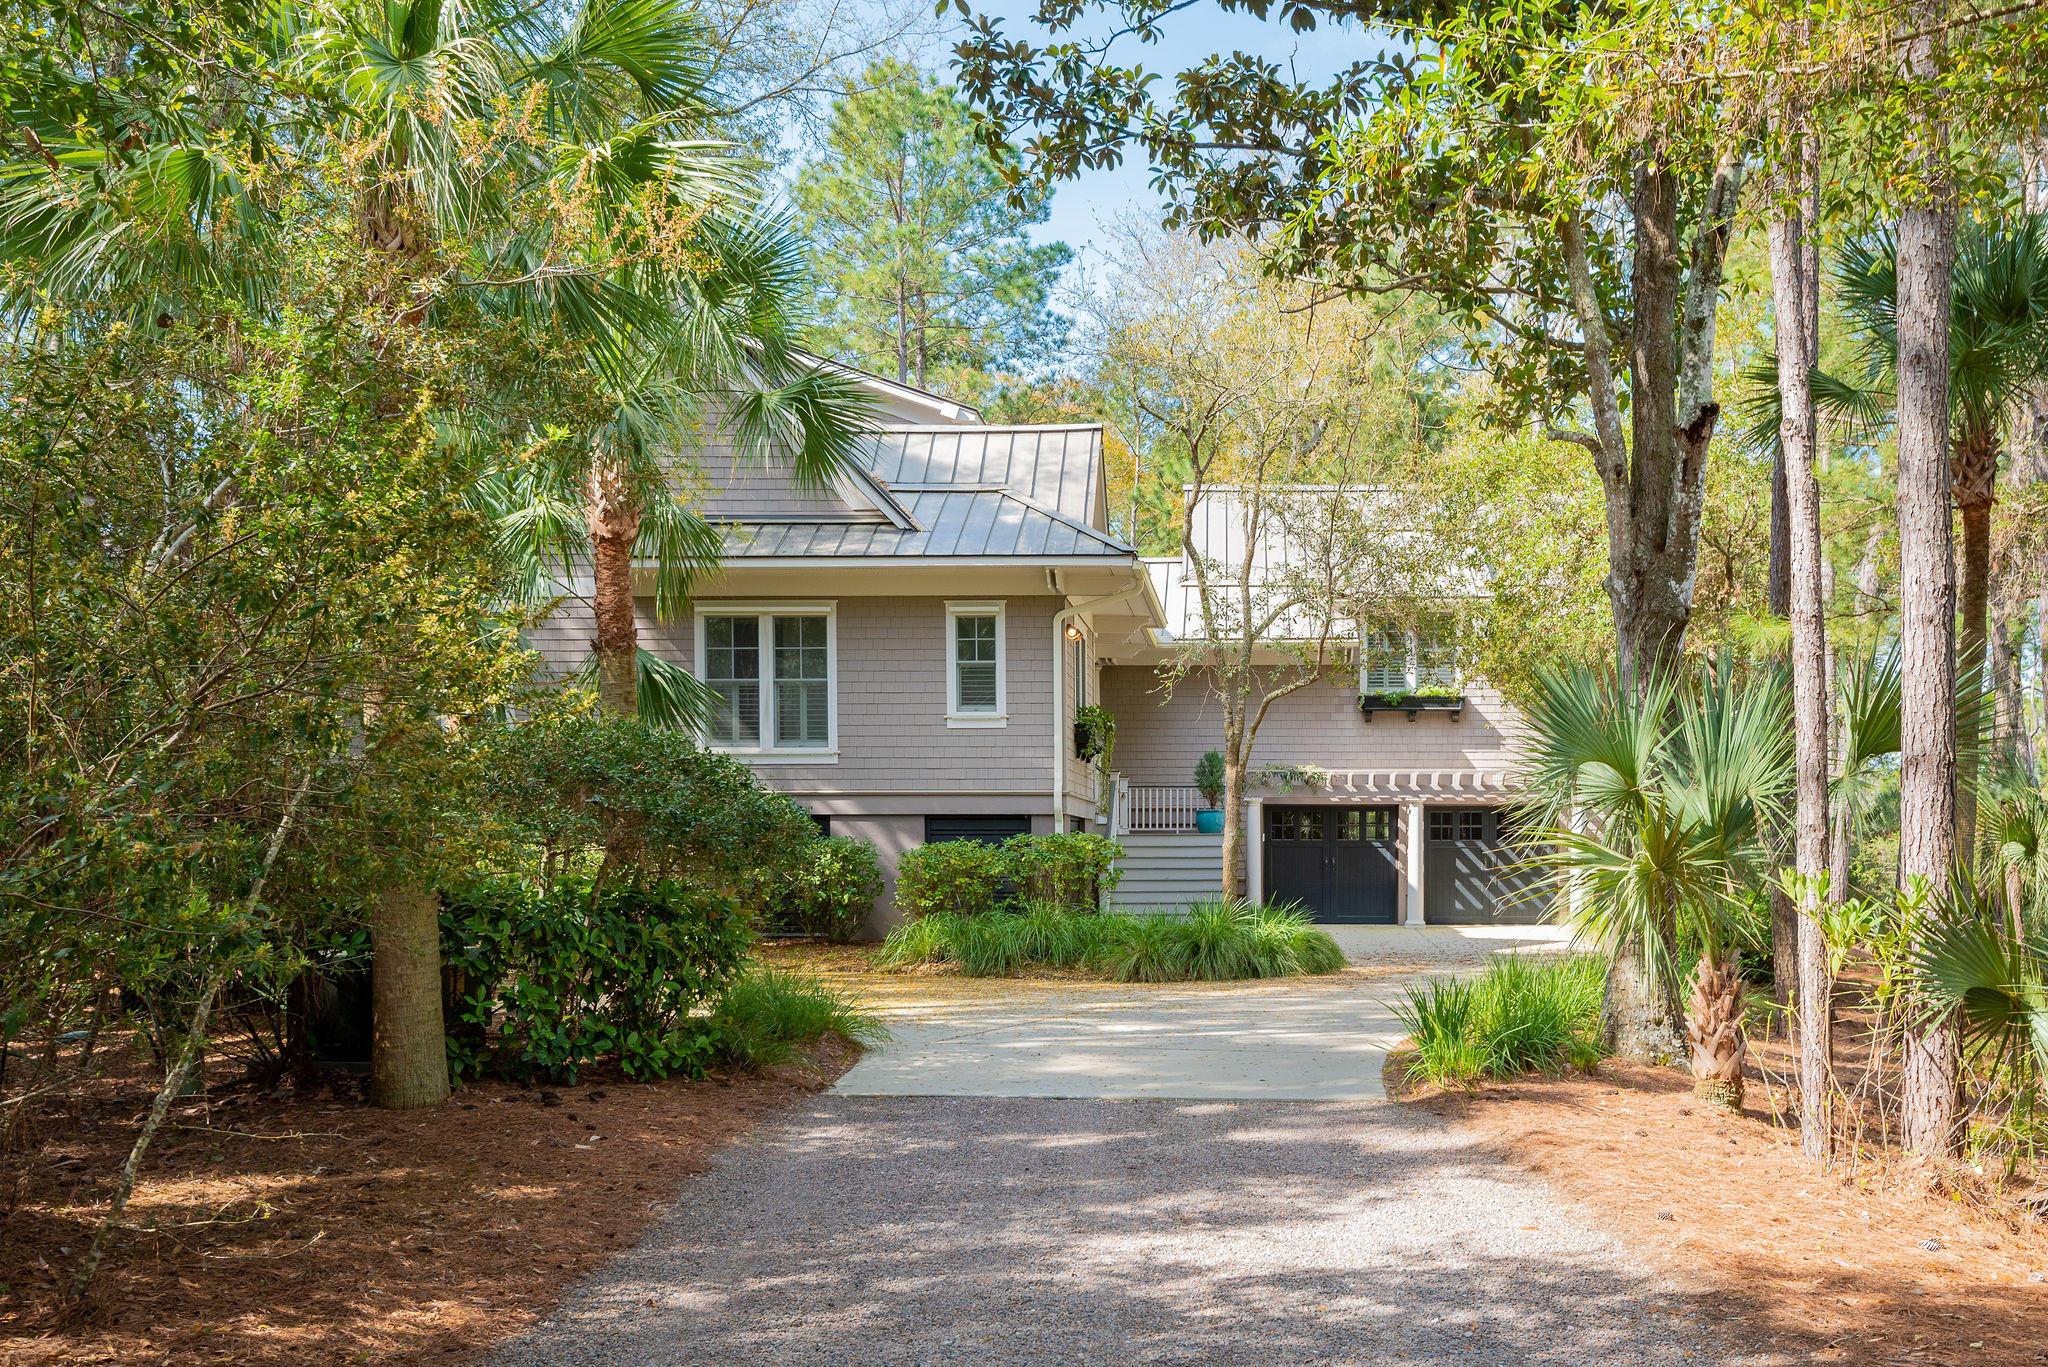 Kiawah Island Homes For Sale - 3 Grey Widgeon, Kiawah Island, SC - 58